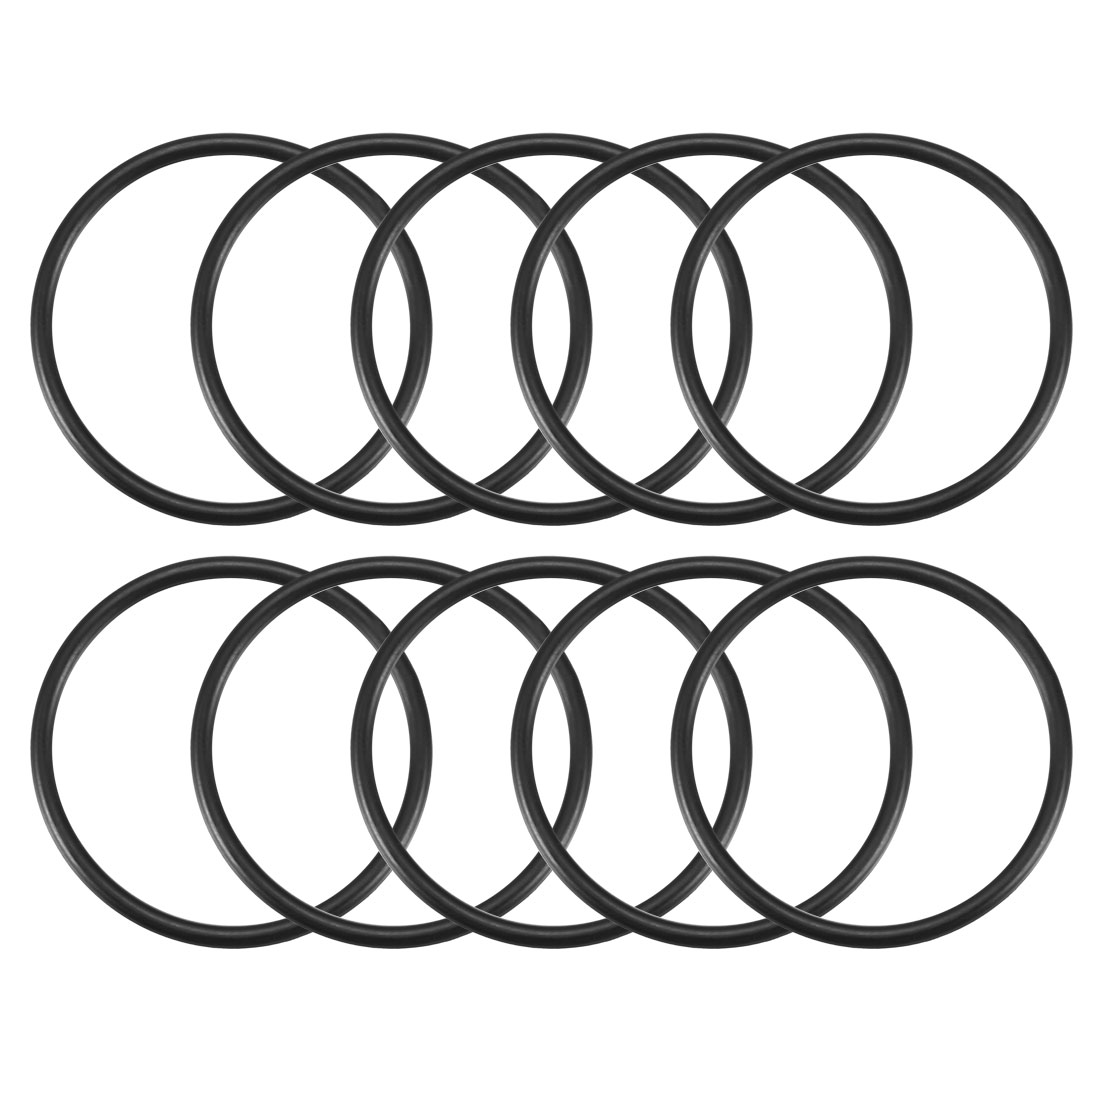 10 Pcs Black 35mm x 2mm NBR Oil Resistant Sealing Ring O-shape Grommets